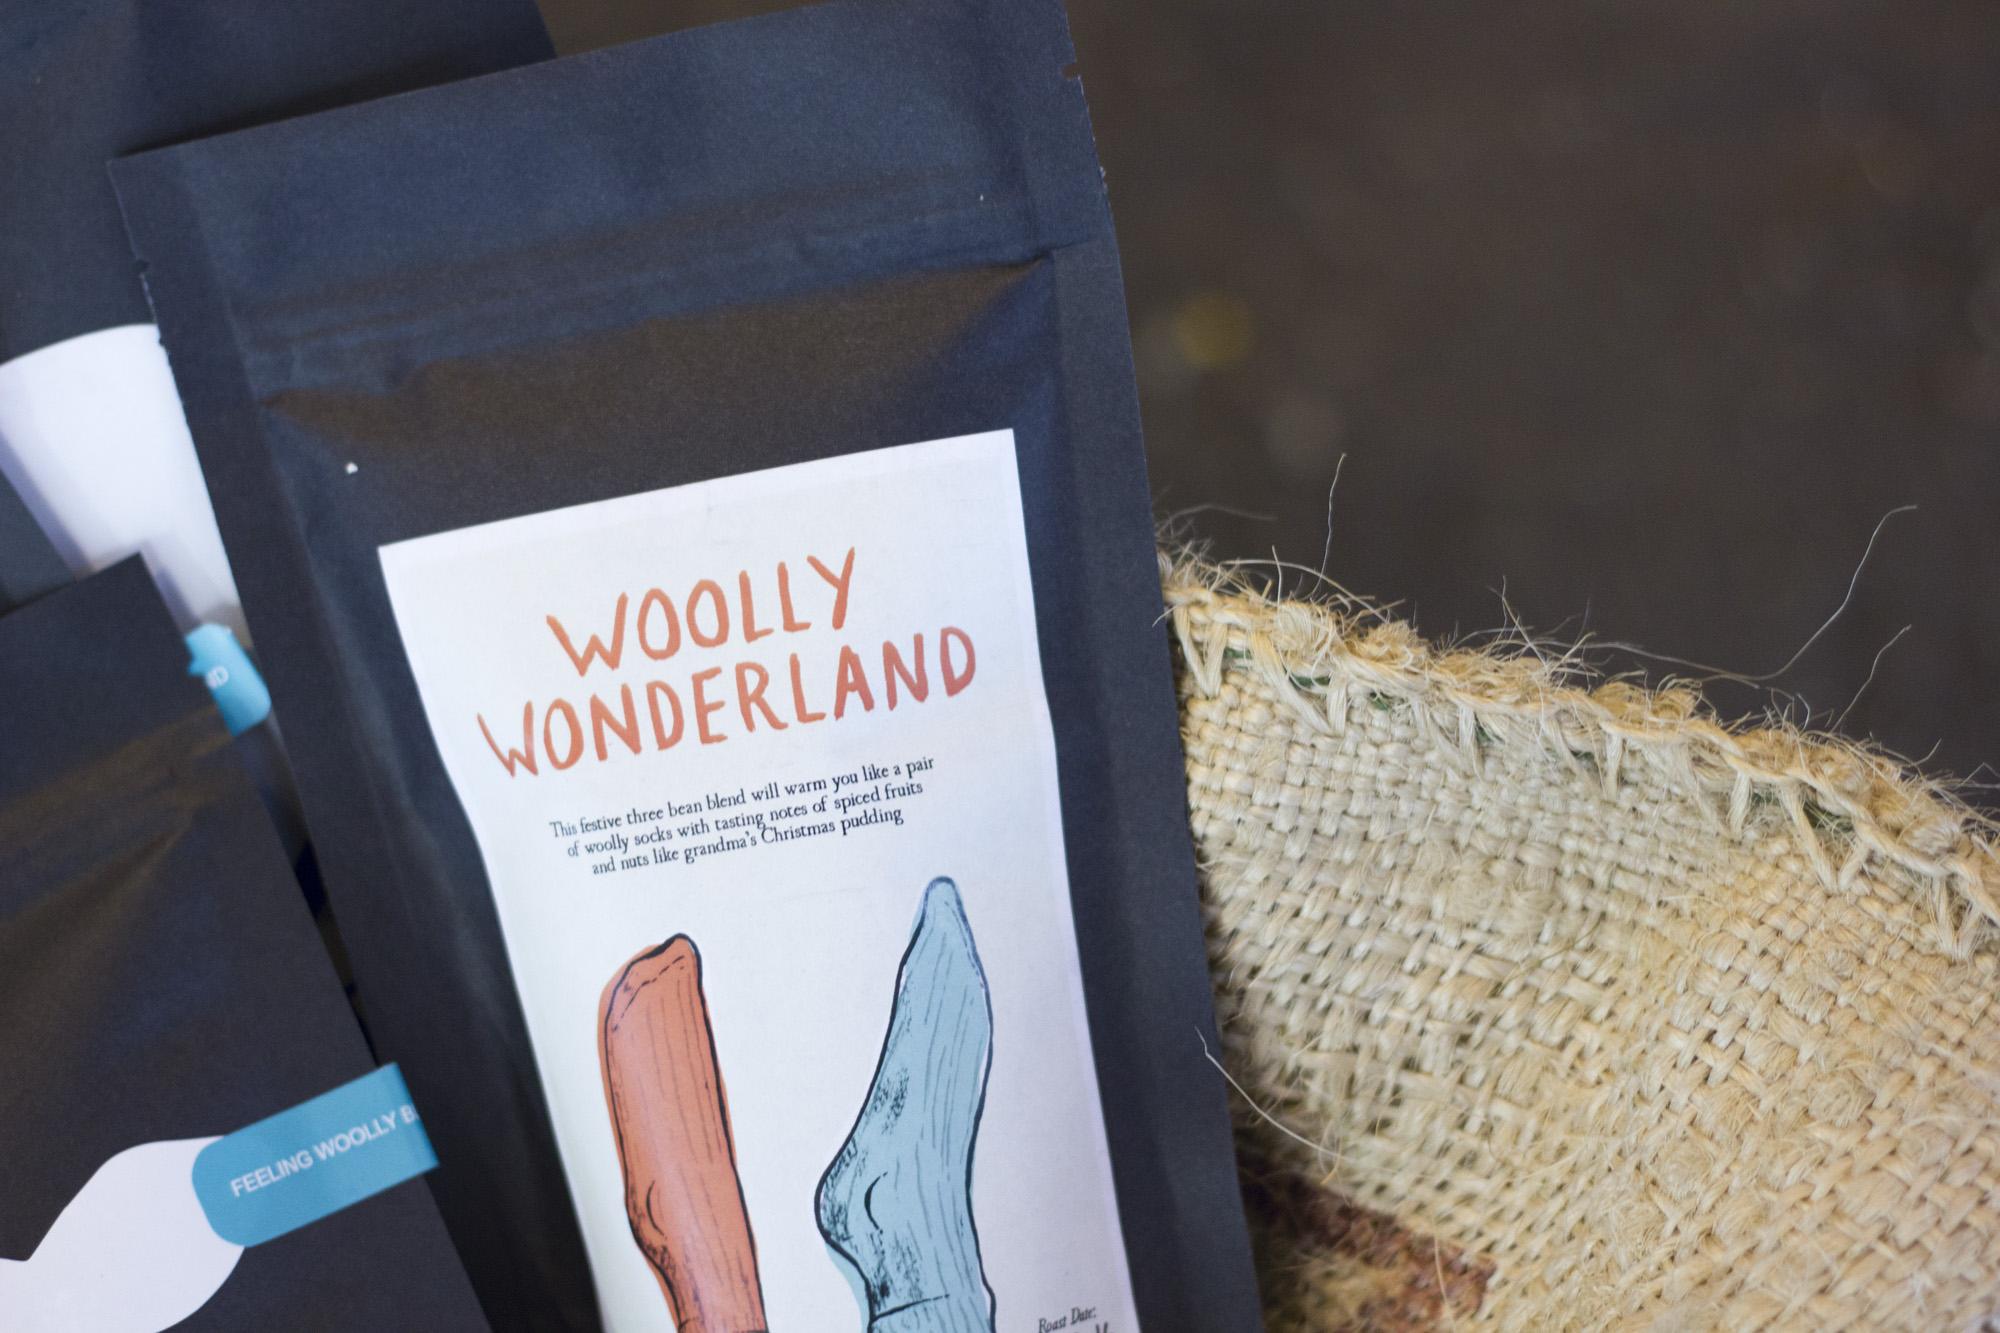 Woolly Wonderland Packaging redesign Buzz Studios 2015.